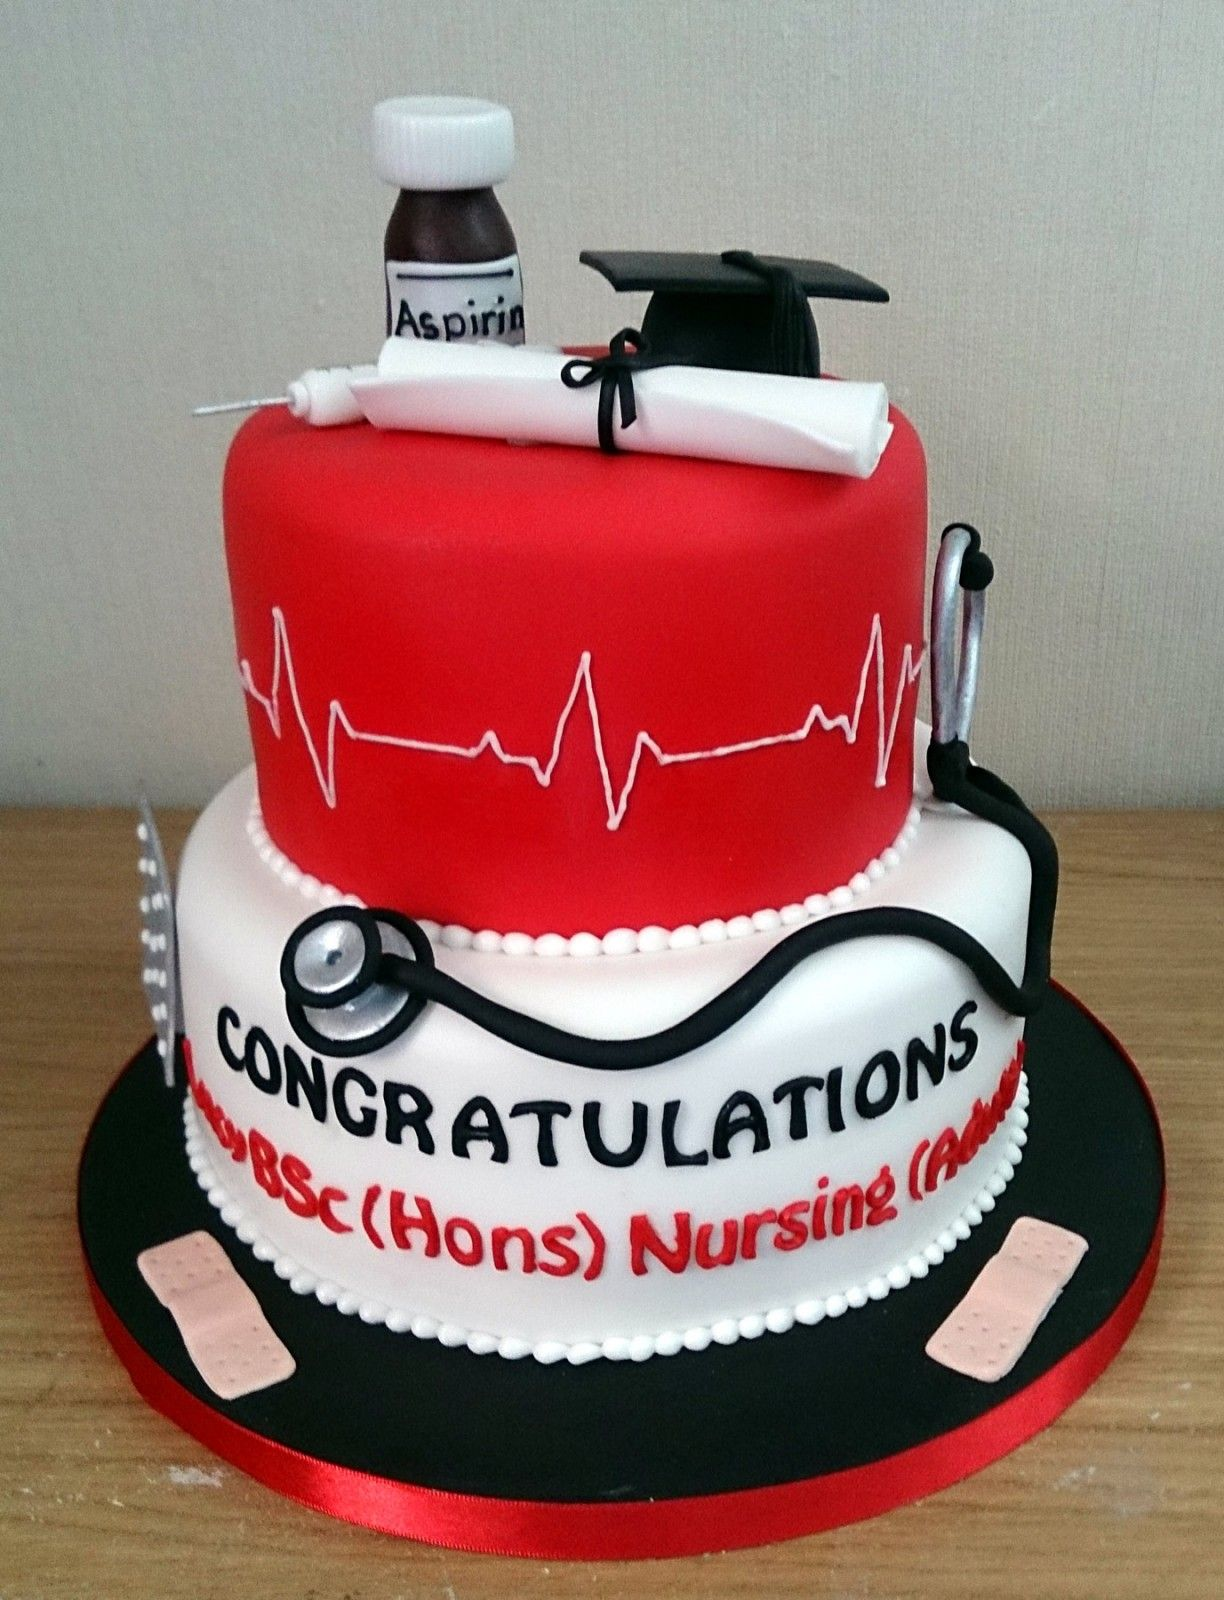 Nursing Graduation Cakes Yahoo Image Search Results Coooook Iyi Fikiiiiir 2018 Pinterest Tort